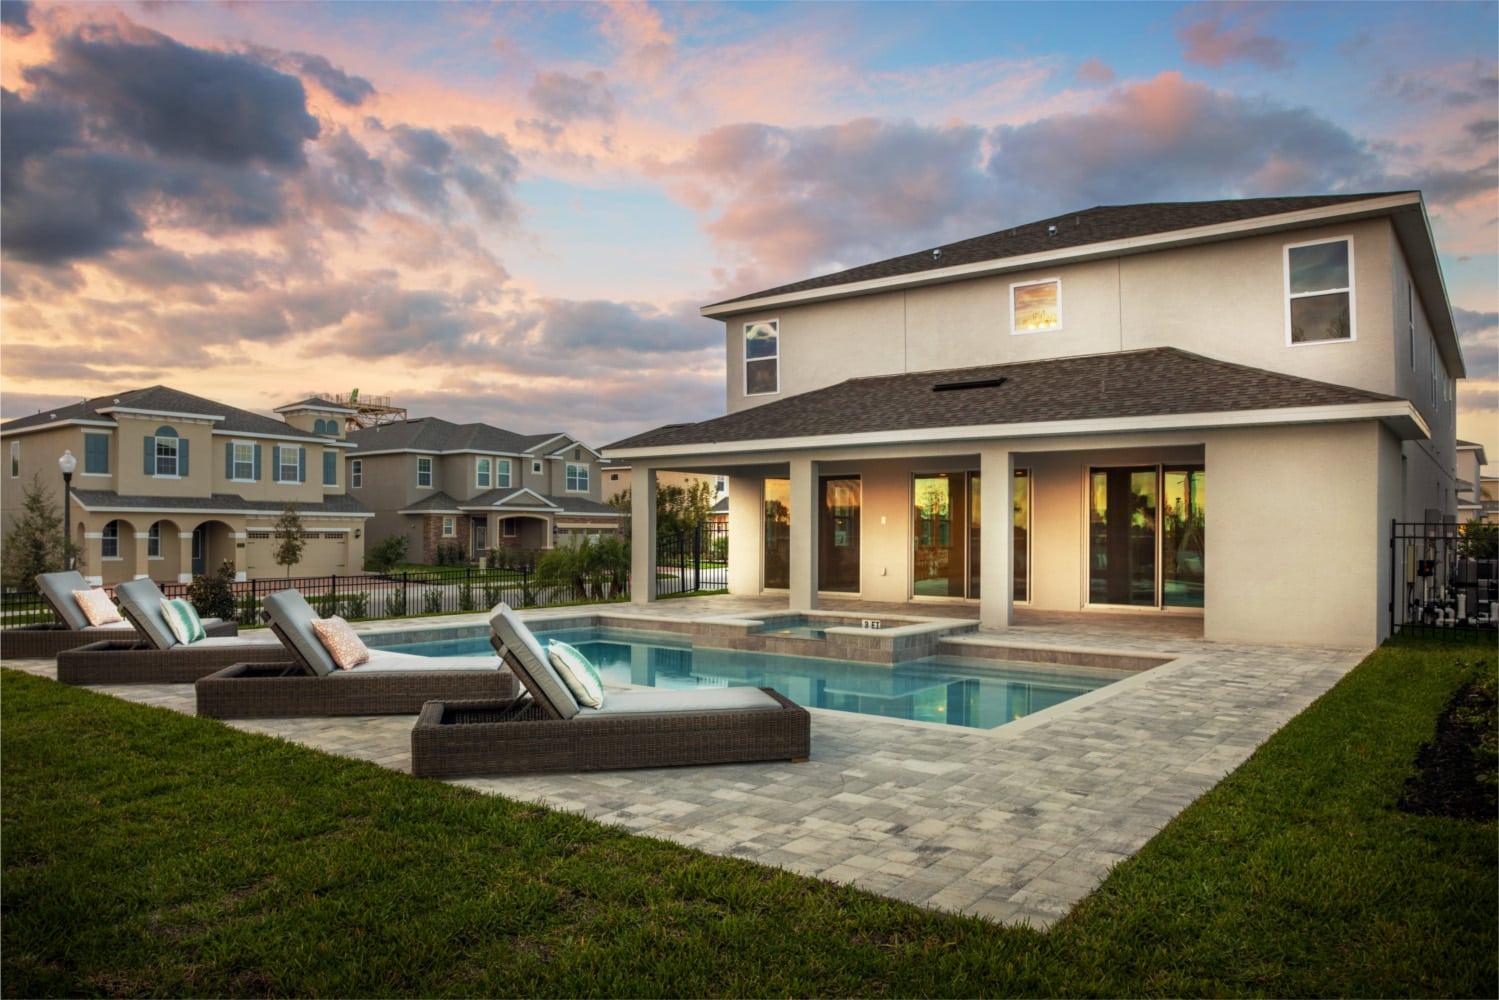 Investissement rentable dans l'immobilier